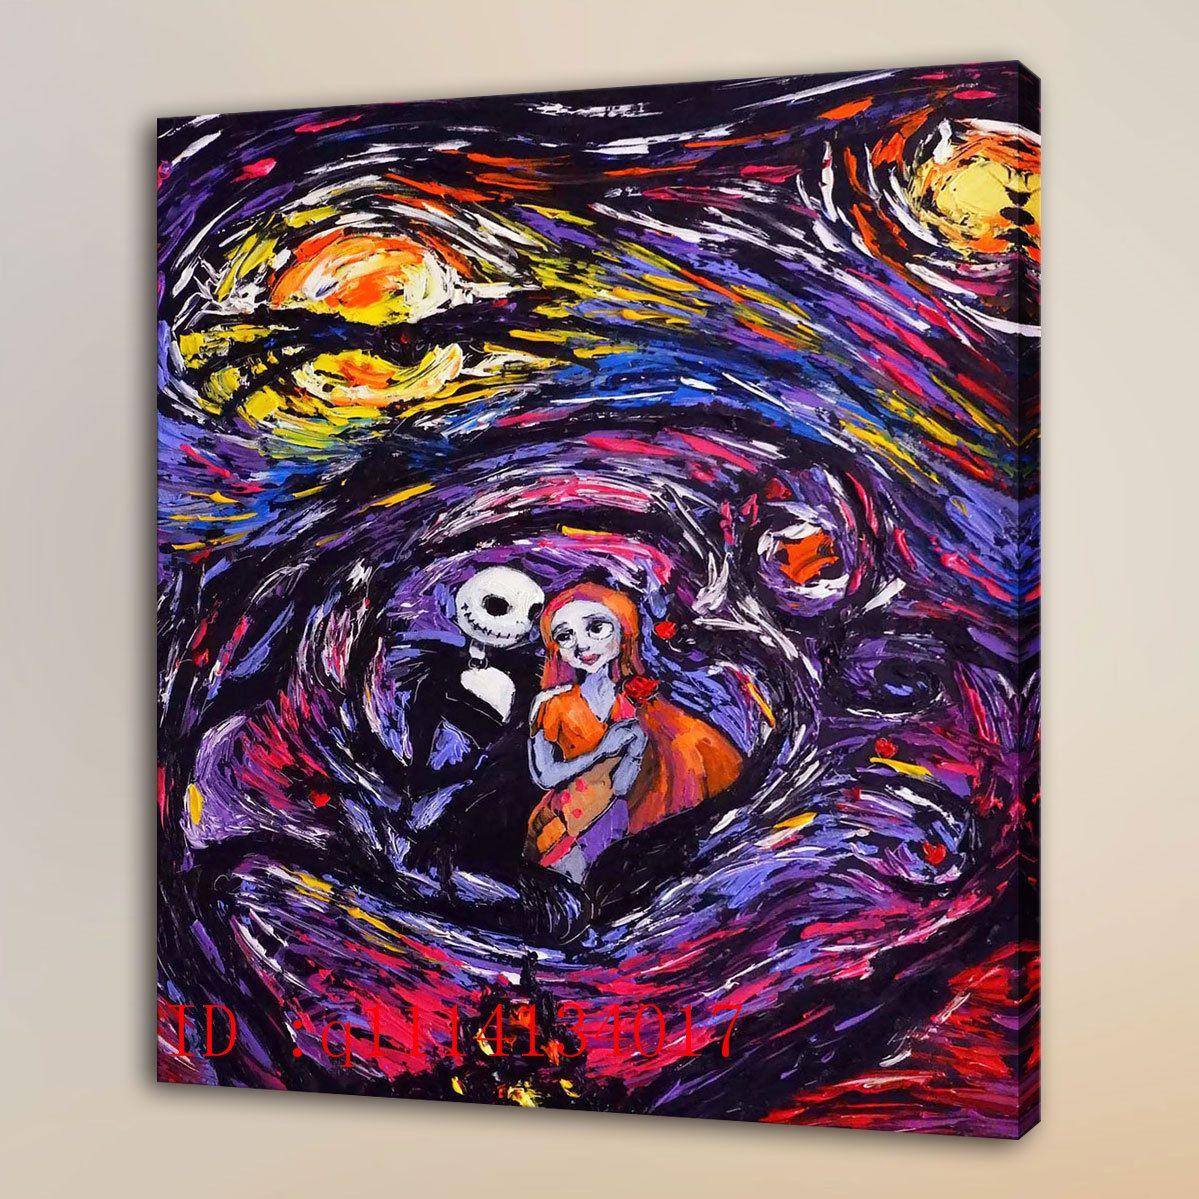 2019 Van Gogh Jack Sally Jack And Sally 1 Hd Canvas Prints Wall Art